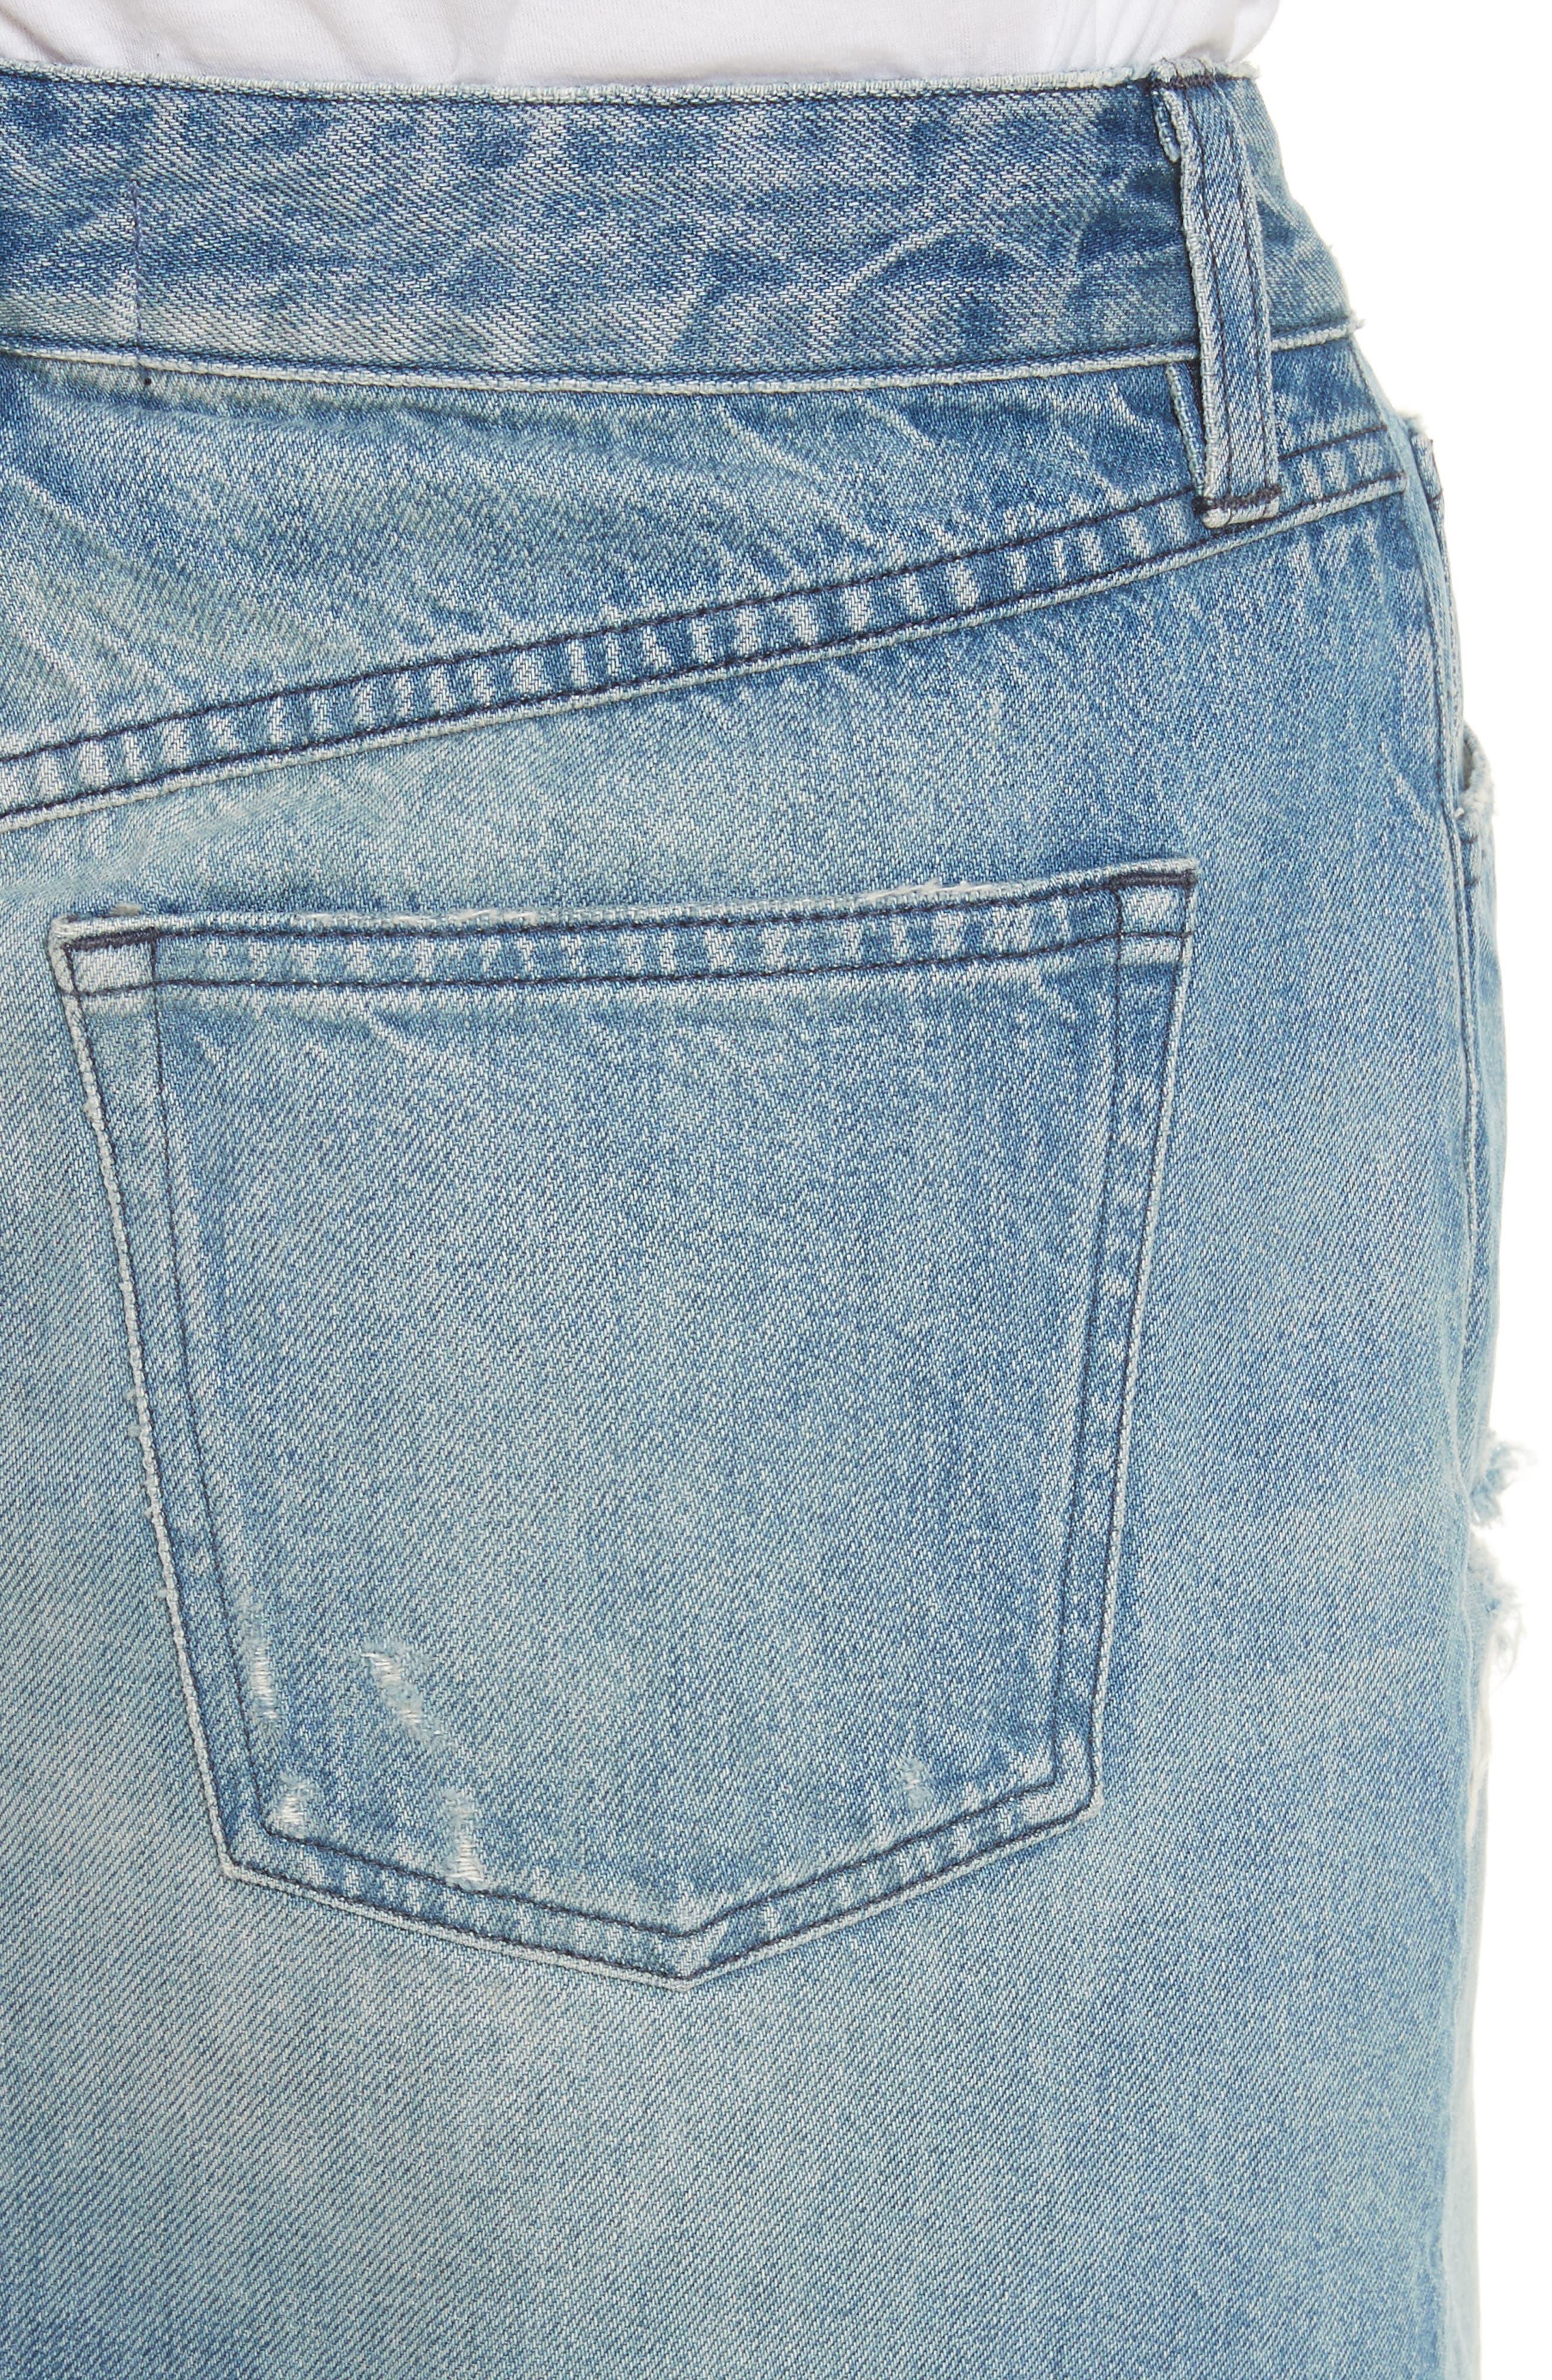 Celine Distressed Denim Skirt,                             Alternate thumbnail 4, color,                             Laz